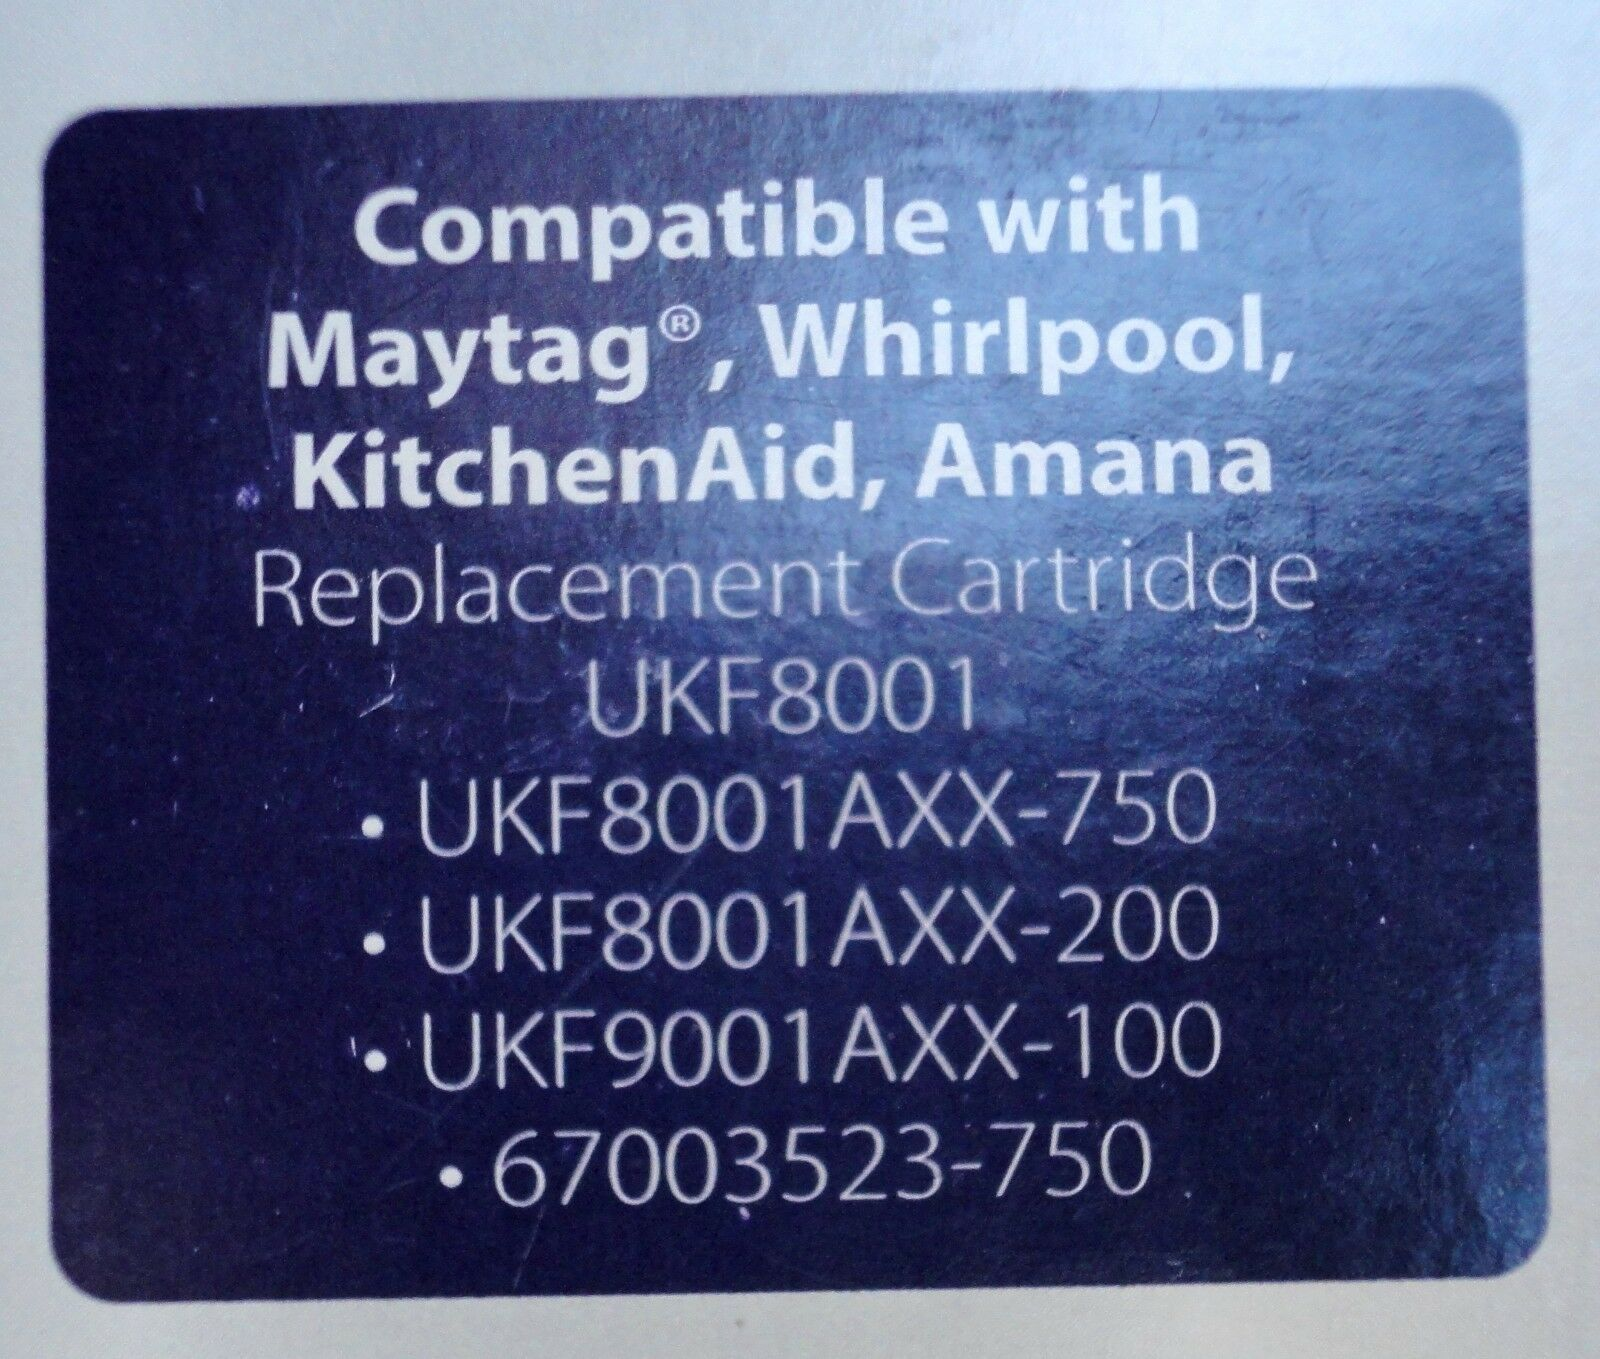 Whirlpool G20EFSB23IX G20EFSB23 G25EFSB23 Wpro UKF8001 fridge water filter filter filter a41828